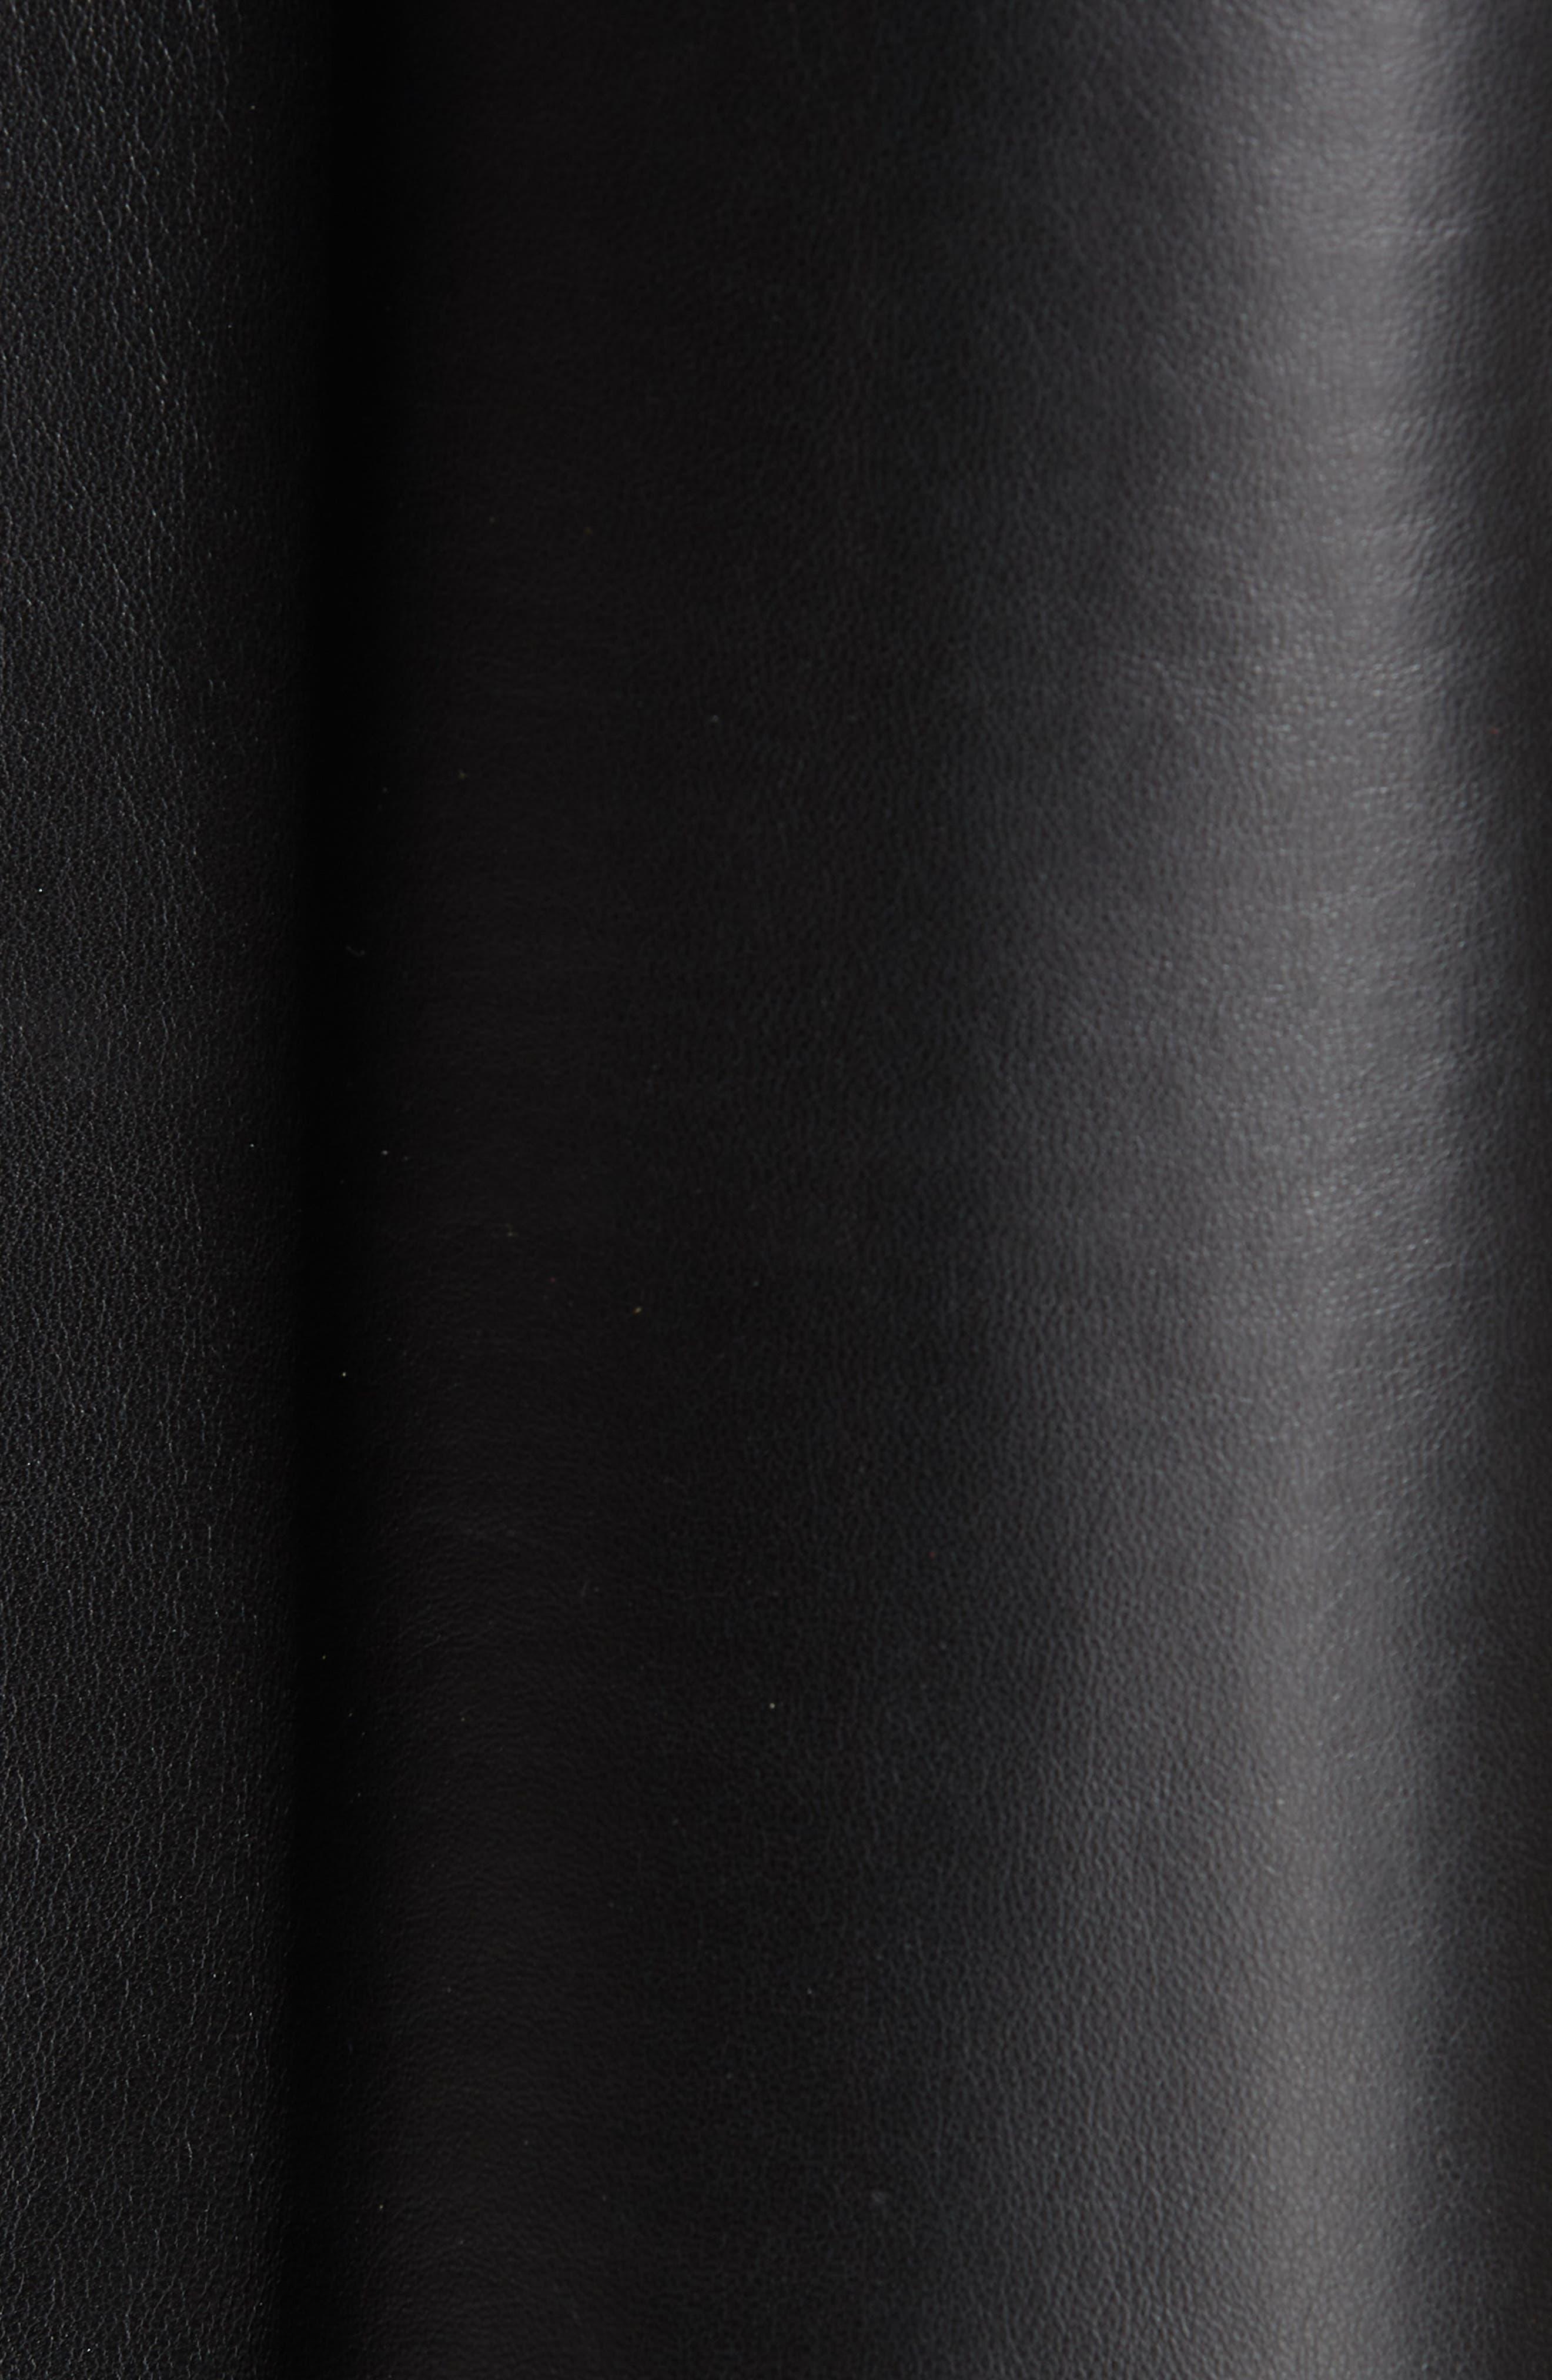 Christopher Leather Jacket,                             Alternate thumbnail 7, color,                             BLACK